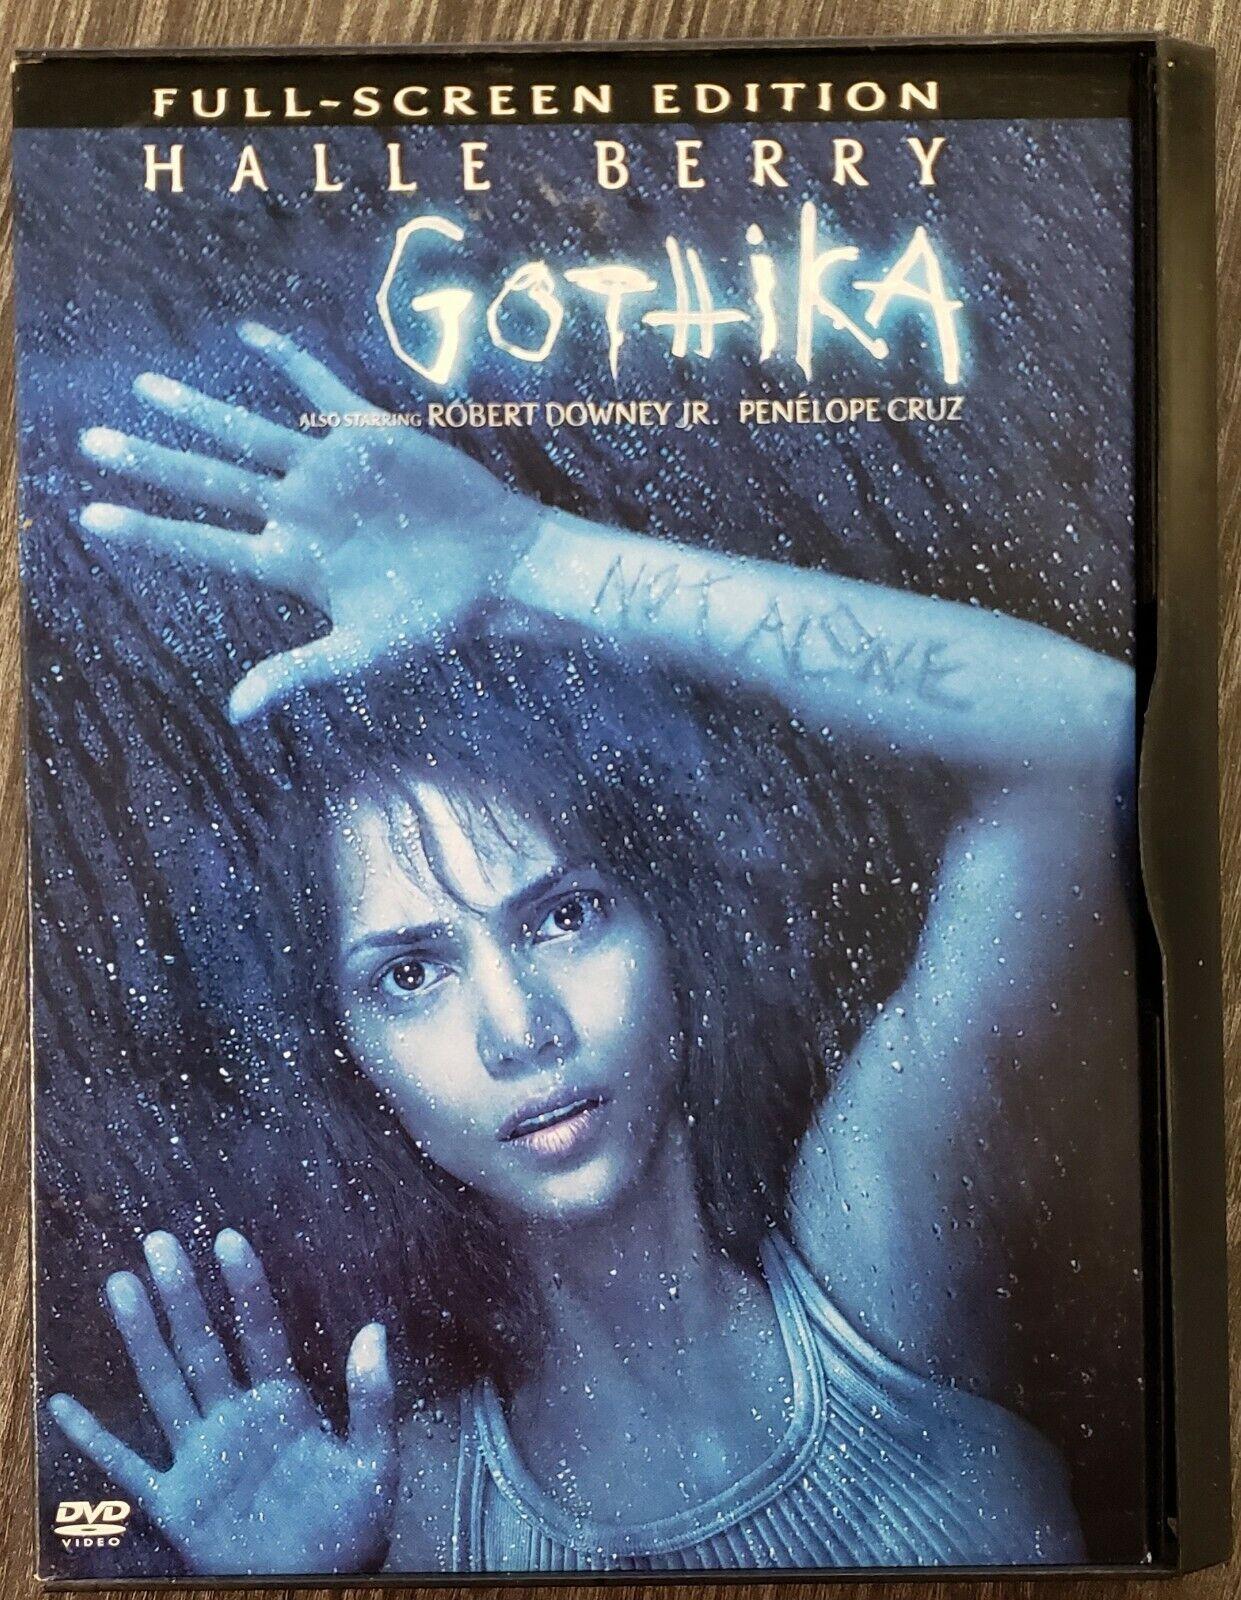 GOTHIKA - DVD - NO RESERVE - Halle Berry - Robert Downey Jr - Penelope Cruz - $0.01